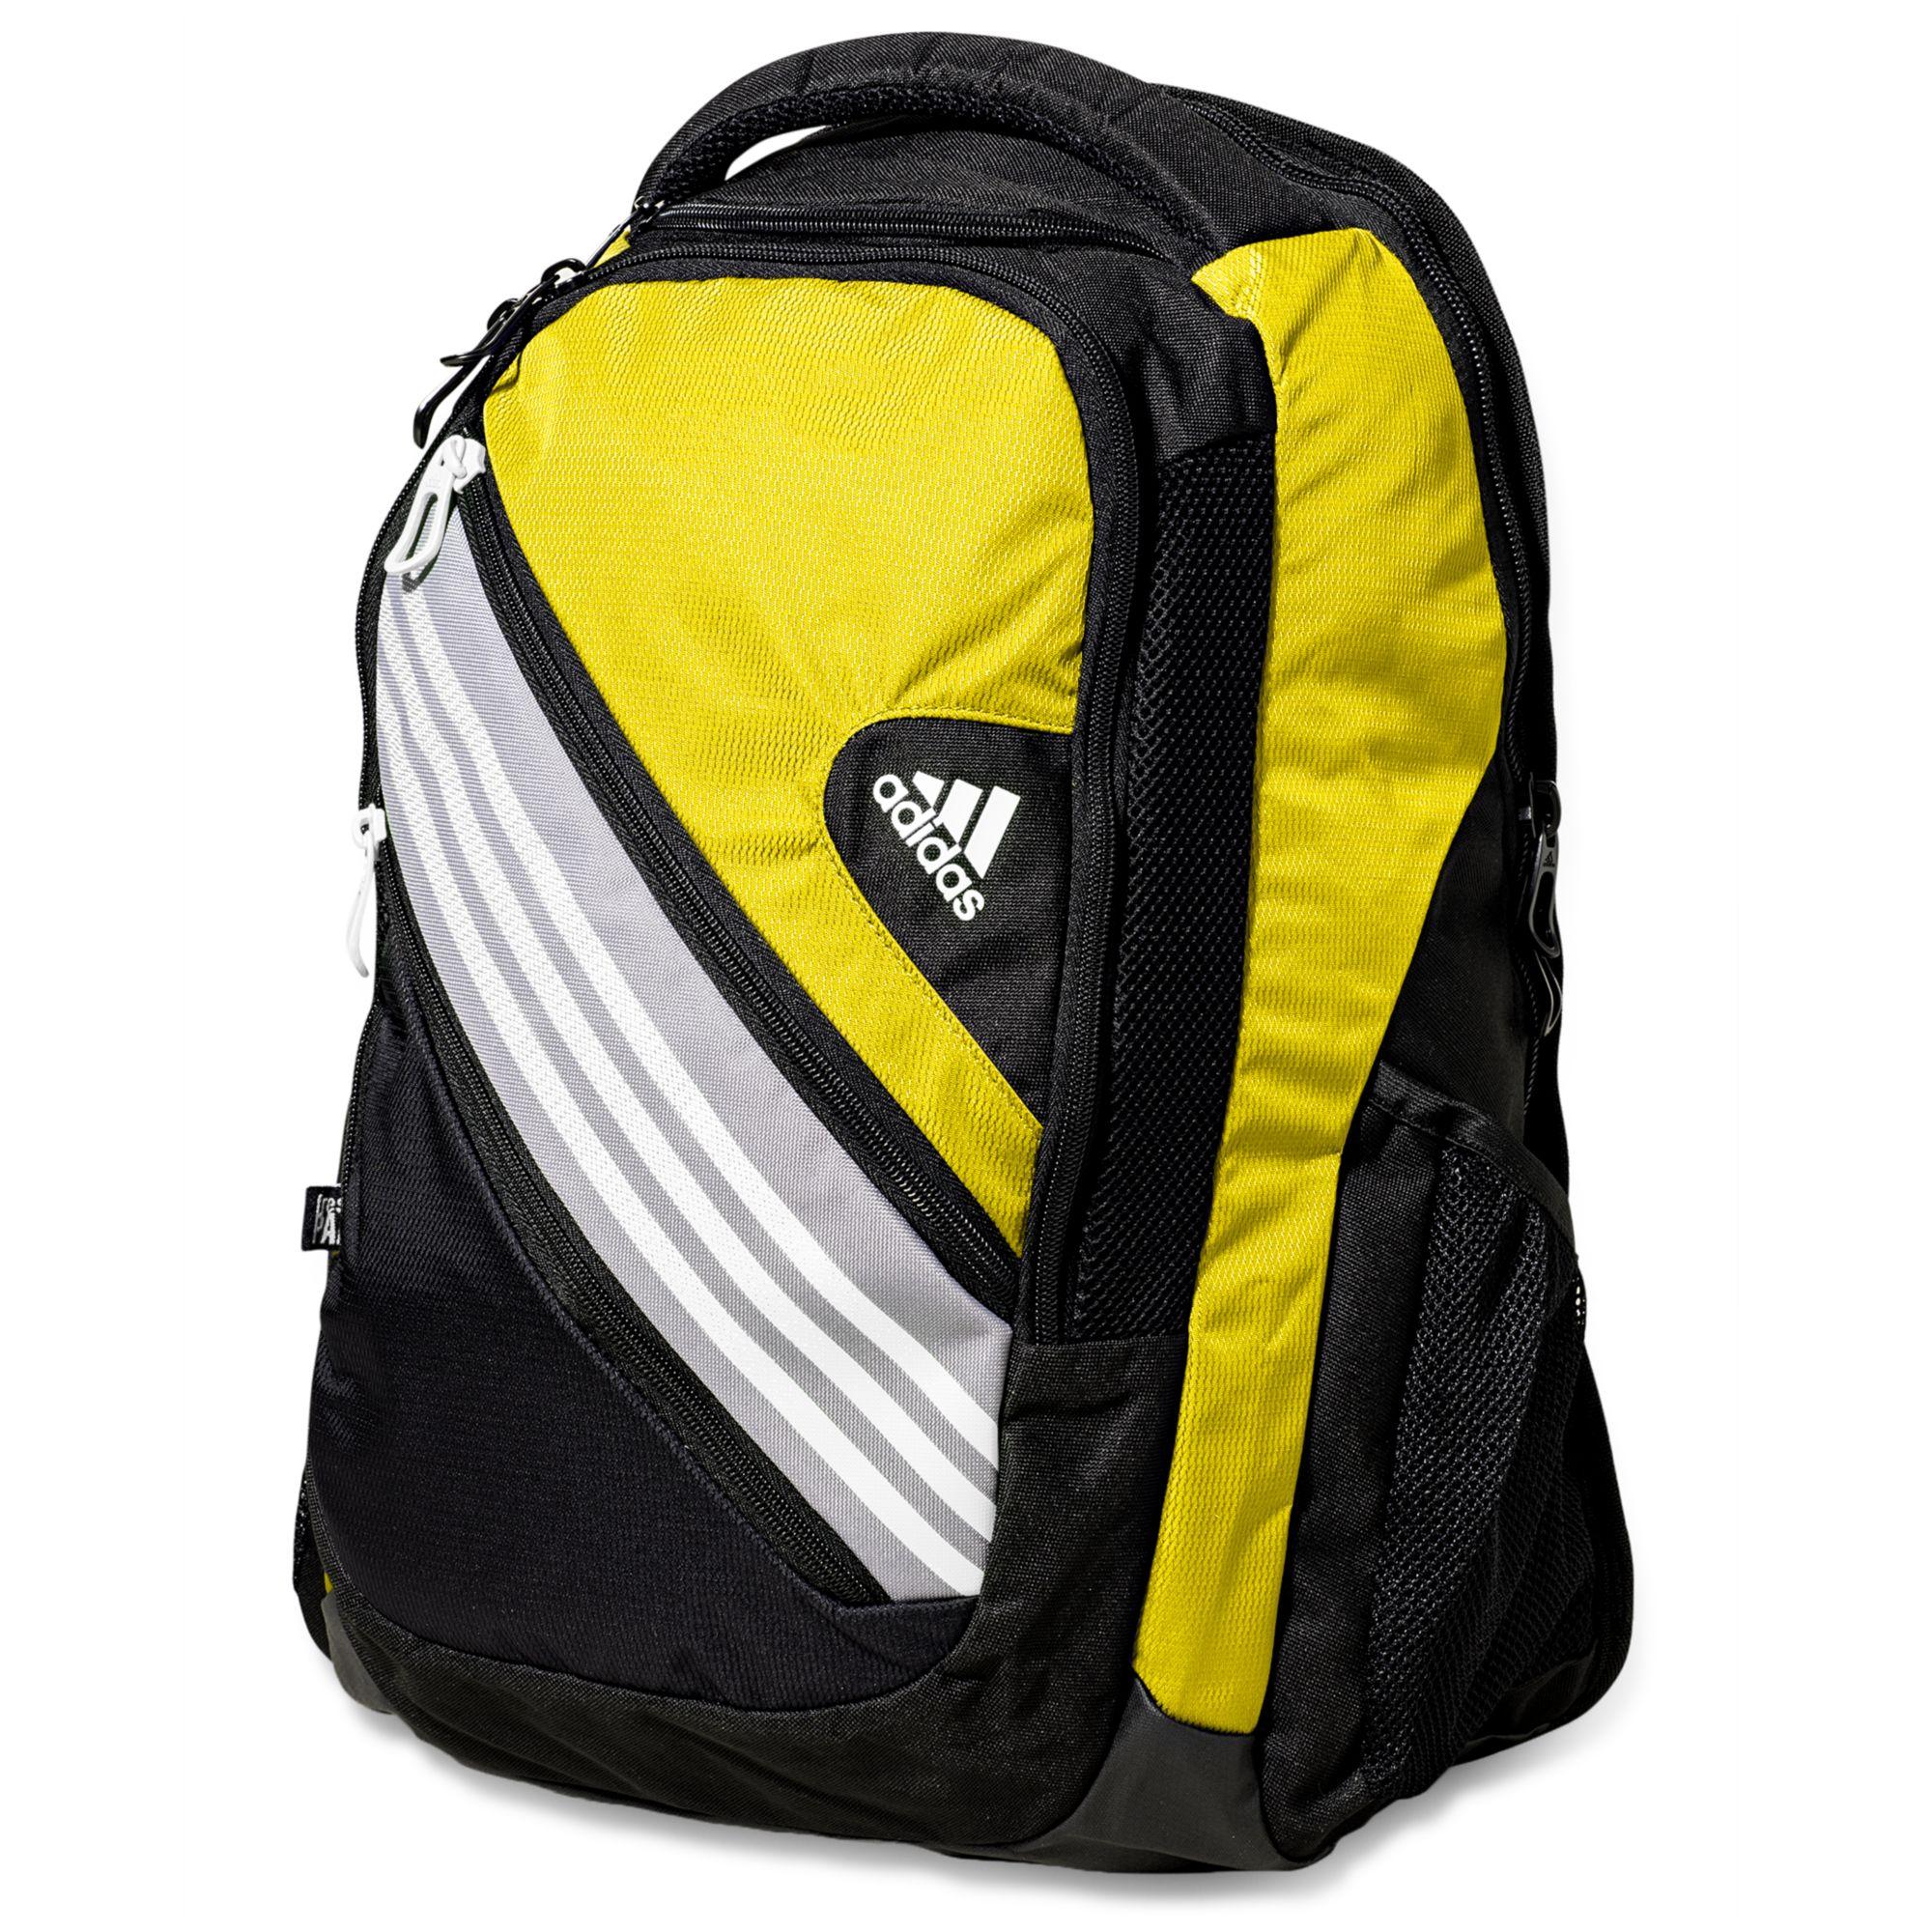 Climacool Speed Iii Backpack